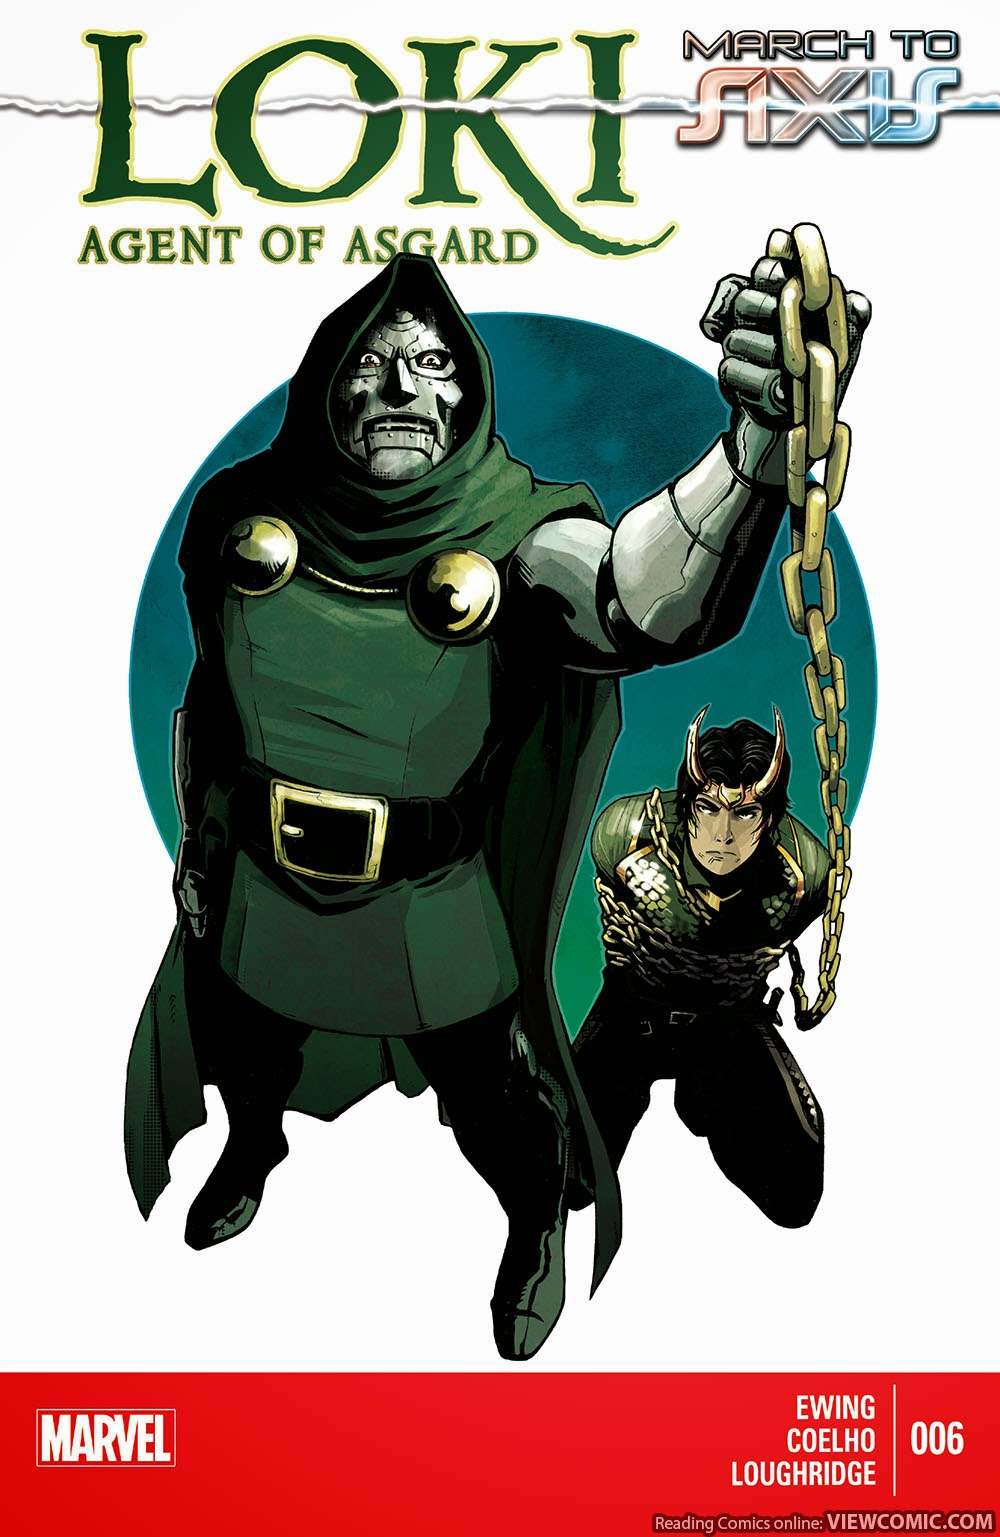 Loki: Agent of Asgard | Viewcomic reading comics online for